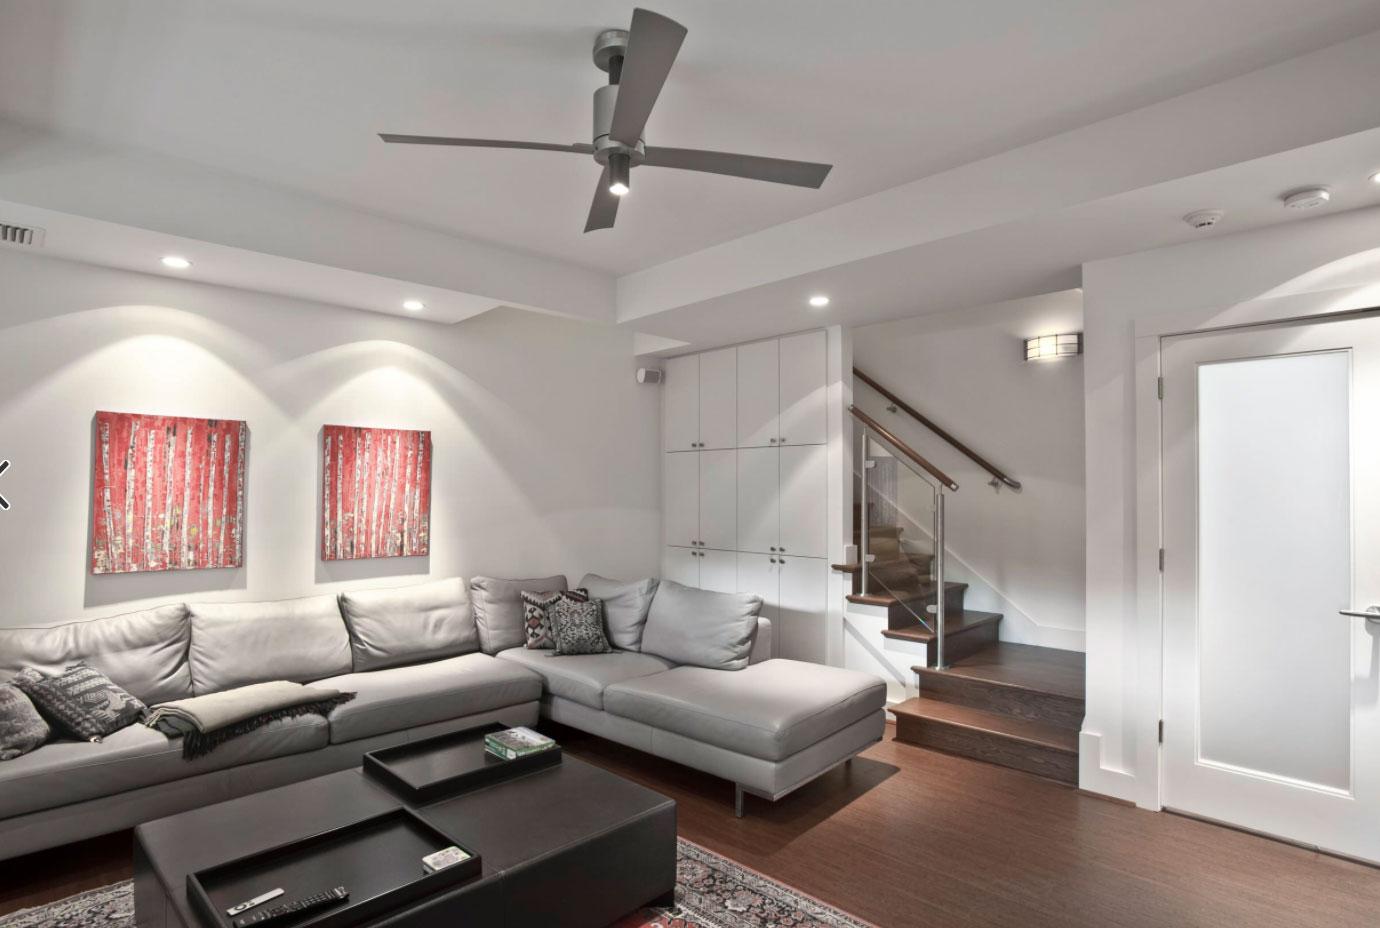 Pensi ceiling fan blog avie pensi ceiling fan with led light by modern co mozeypictures Gallery